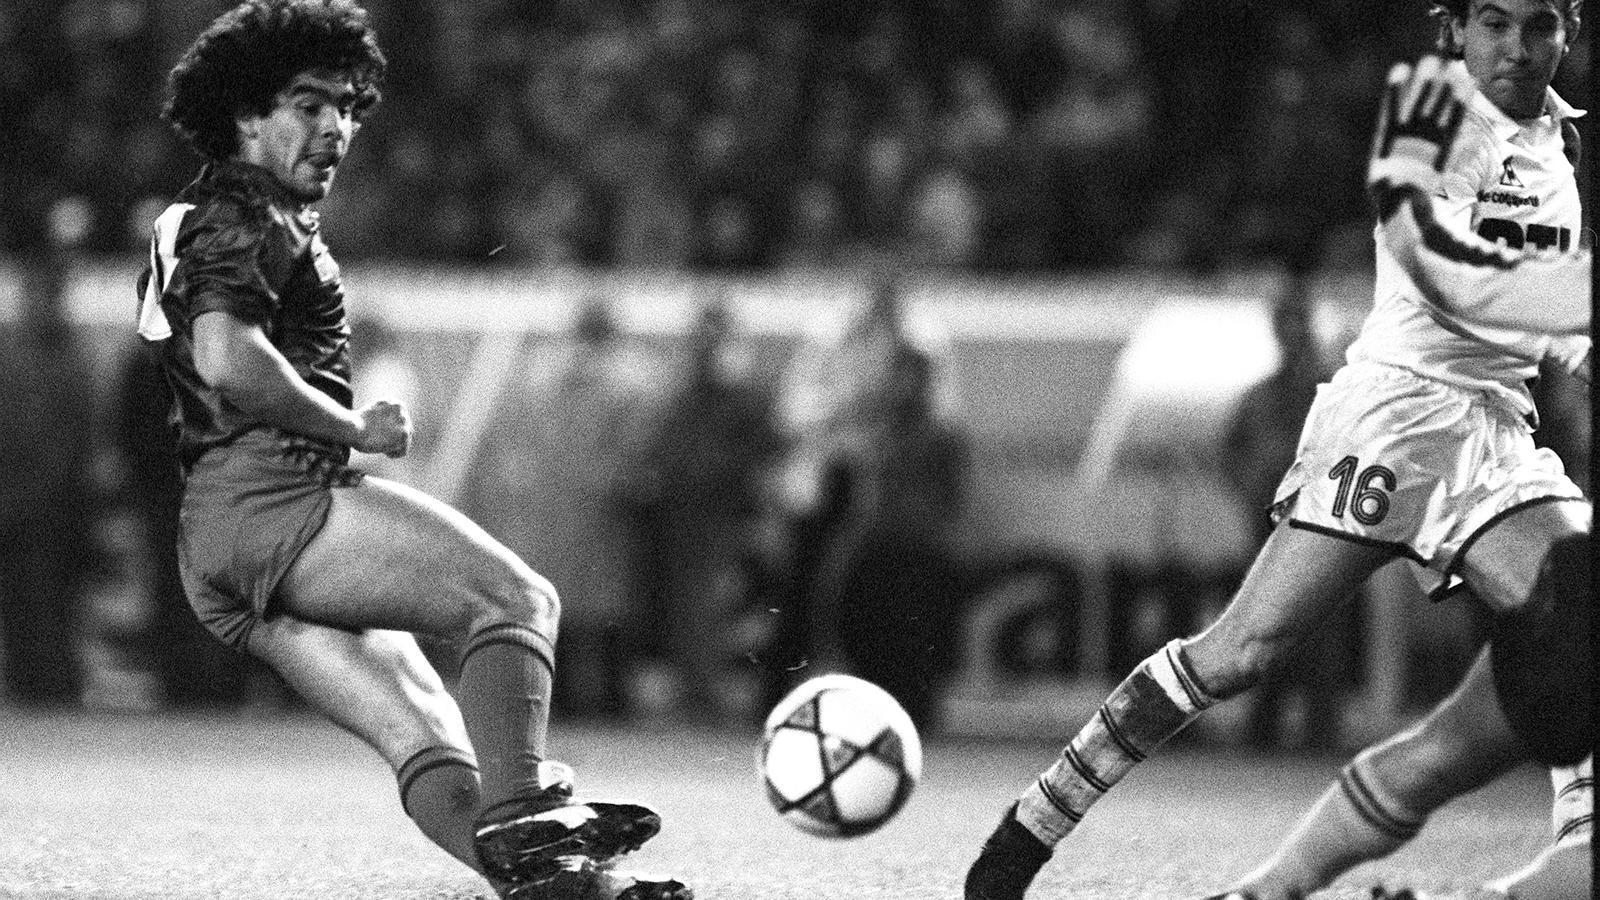 Diego Maradona del FC Barcelona, durant un partit amistos contra el Paris Saint Germain, el 13 de novembre de 1982, a París.